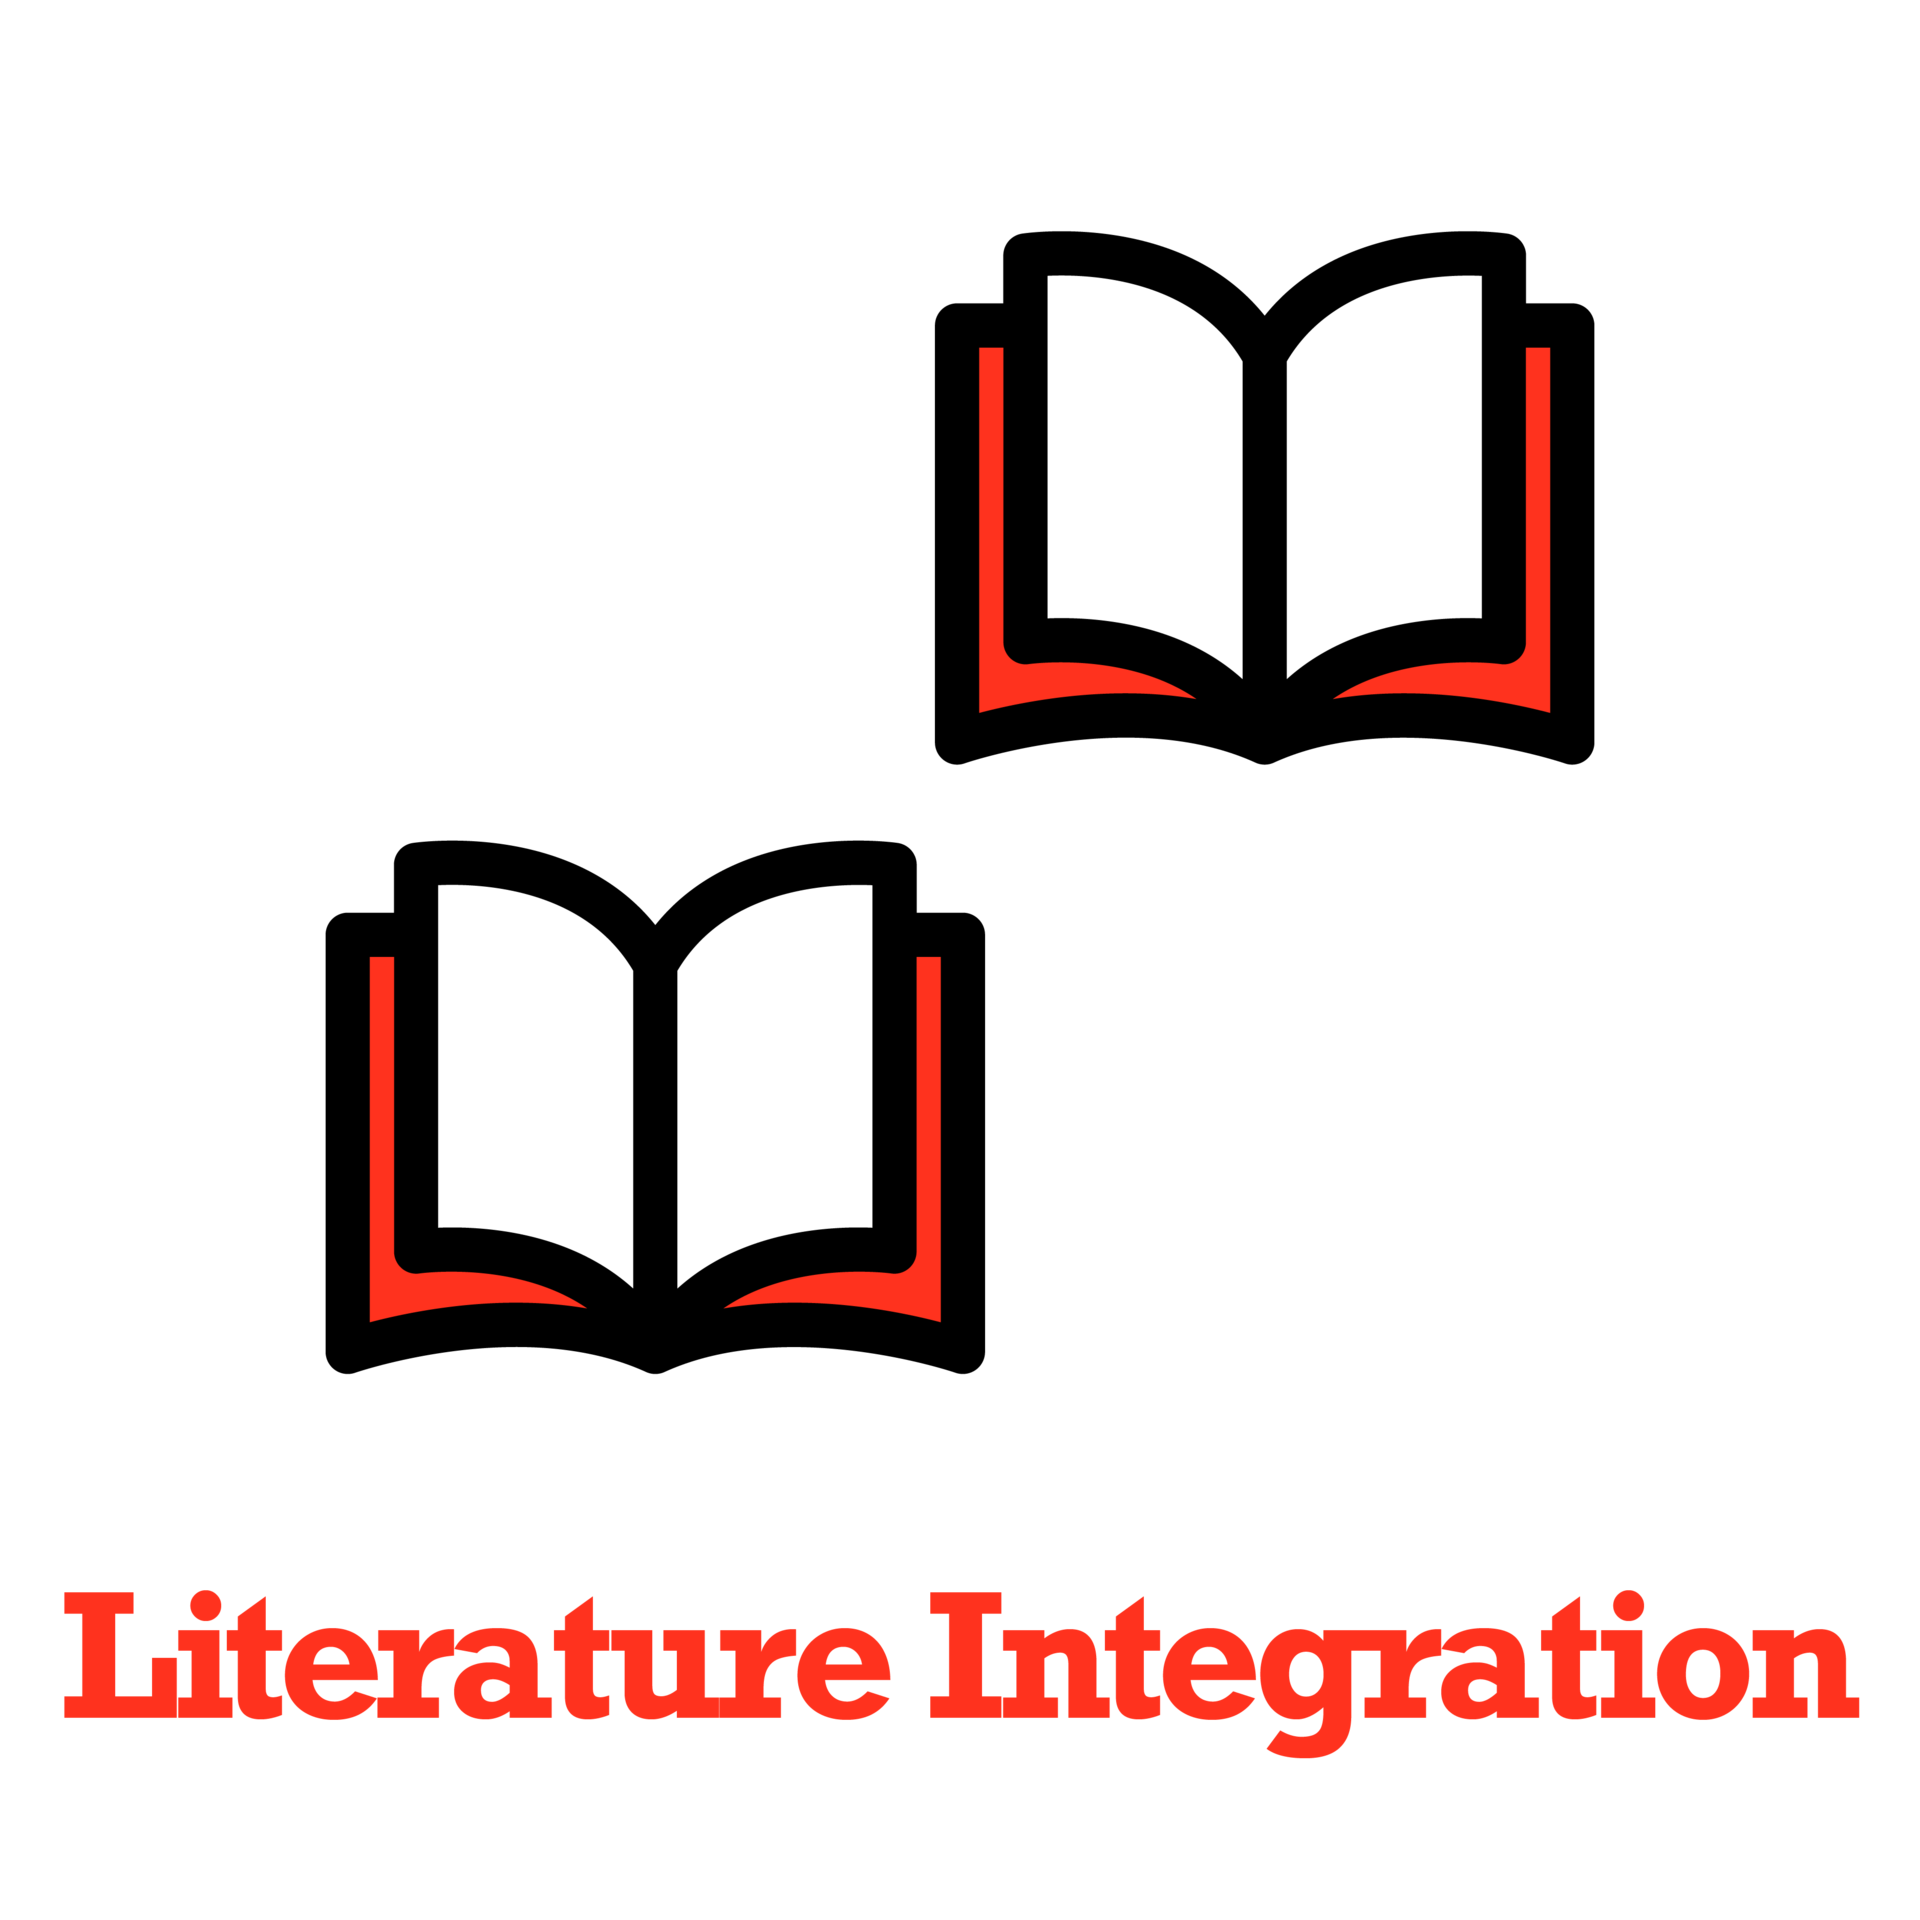 lit integration